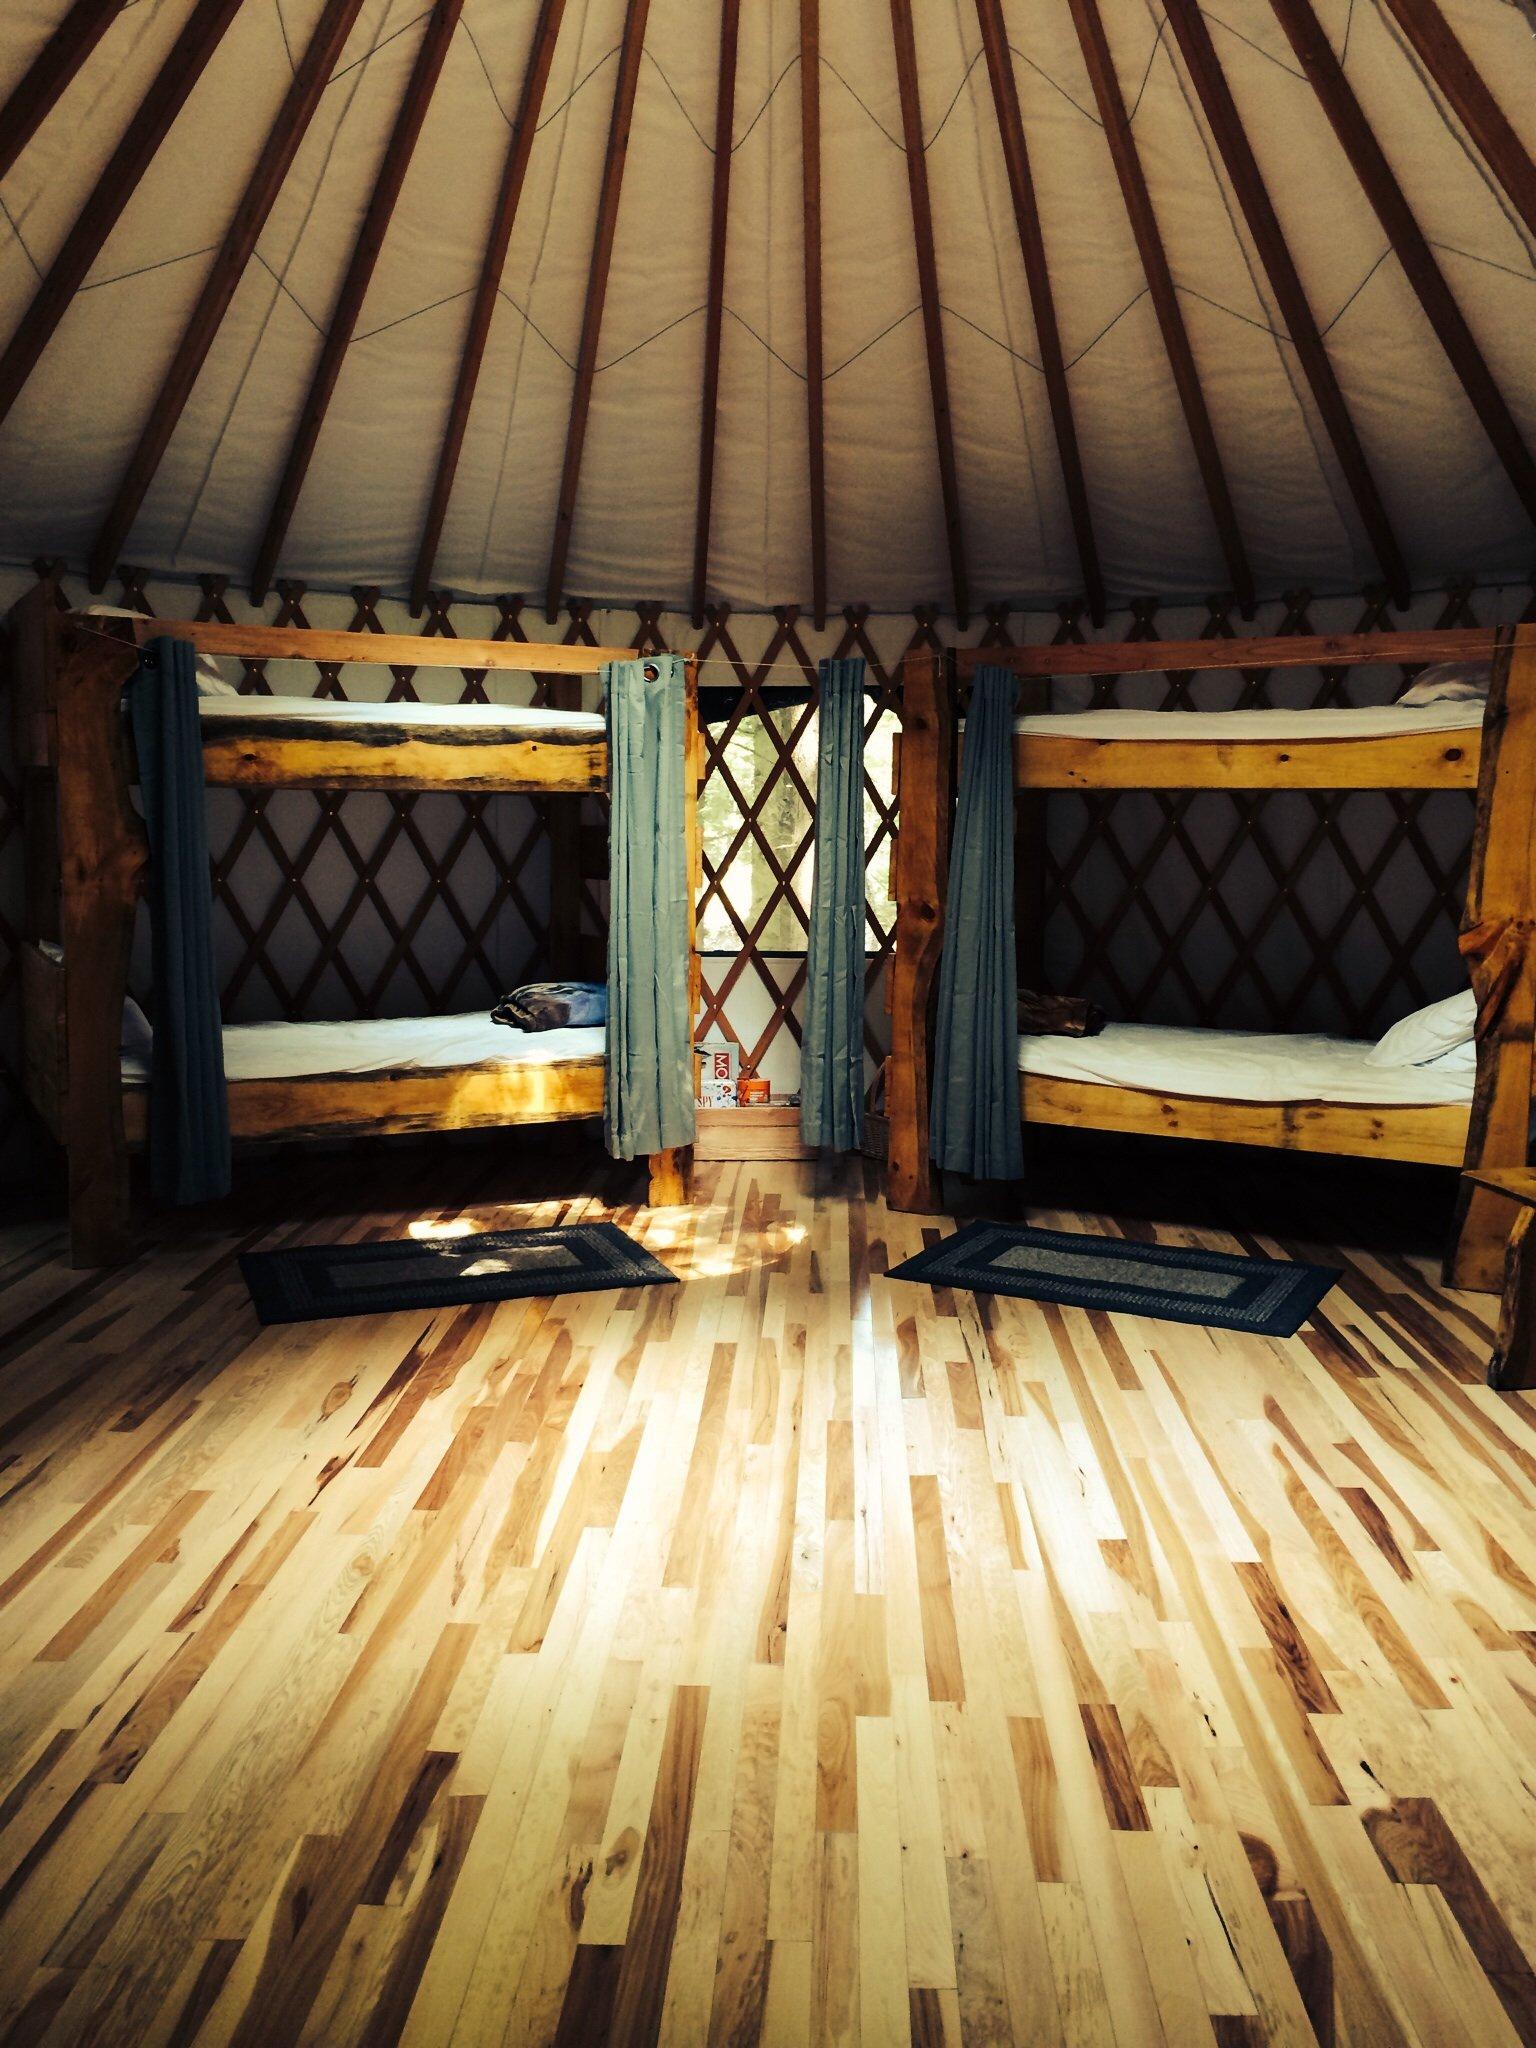 Bunk beds at Hemlock Ridge Yurt